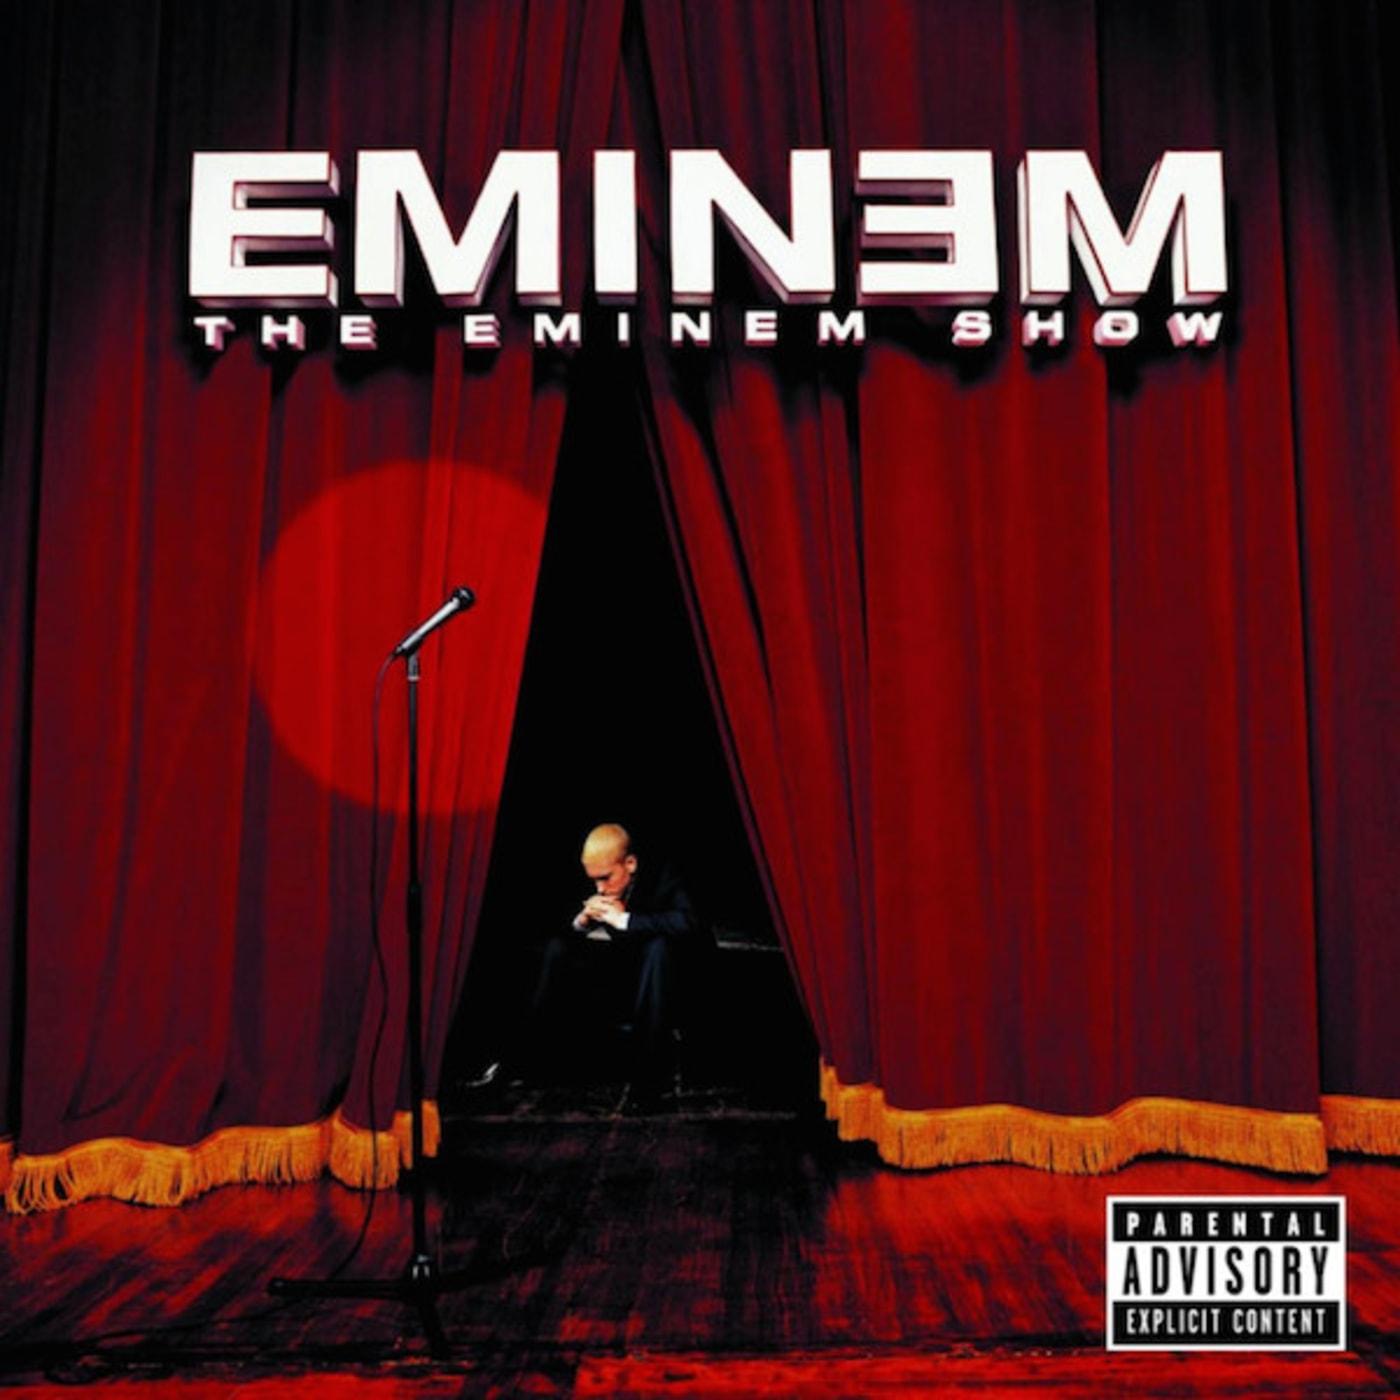 Eminem 'The Eminem Show'